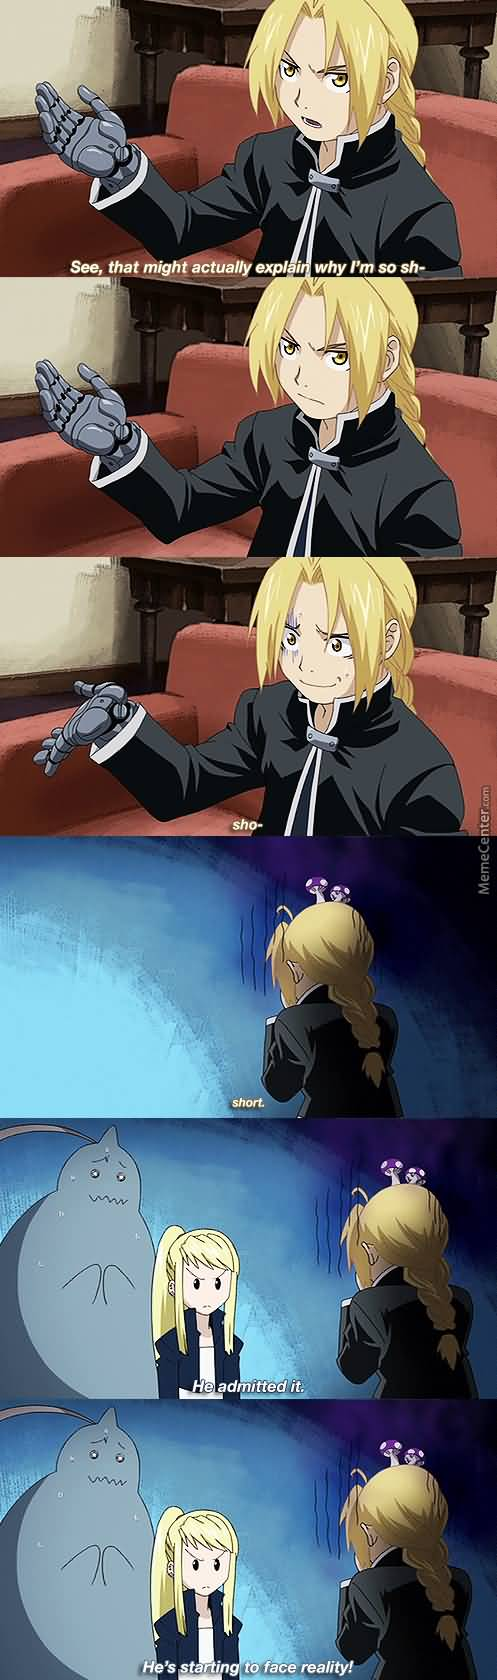 Fullmetal Alchemist Meme Funny Image Photo Joke 12